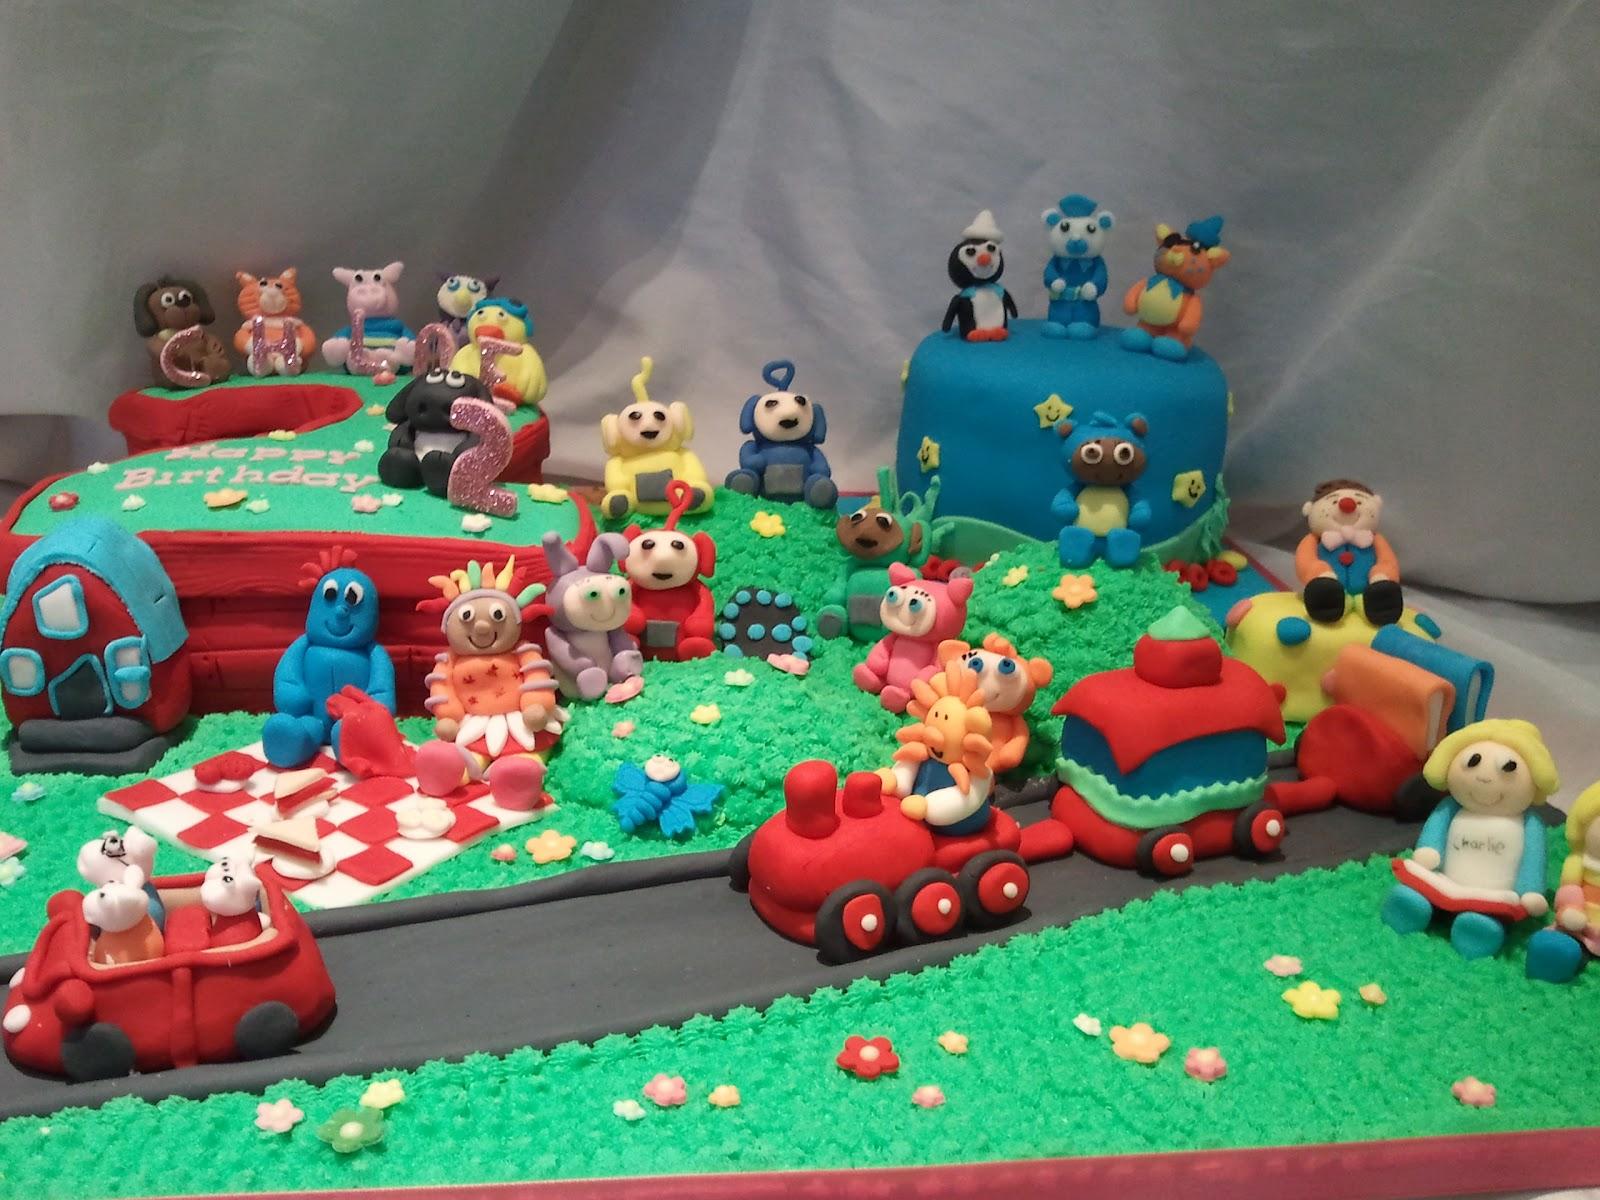 Cbeebies Cbeebies Starry Cakes